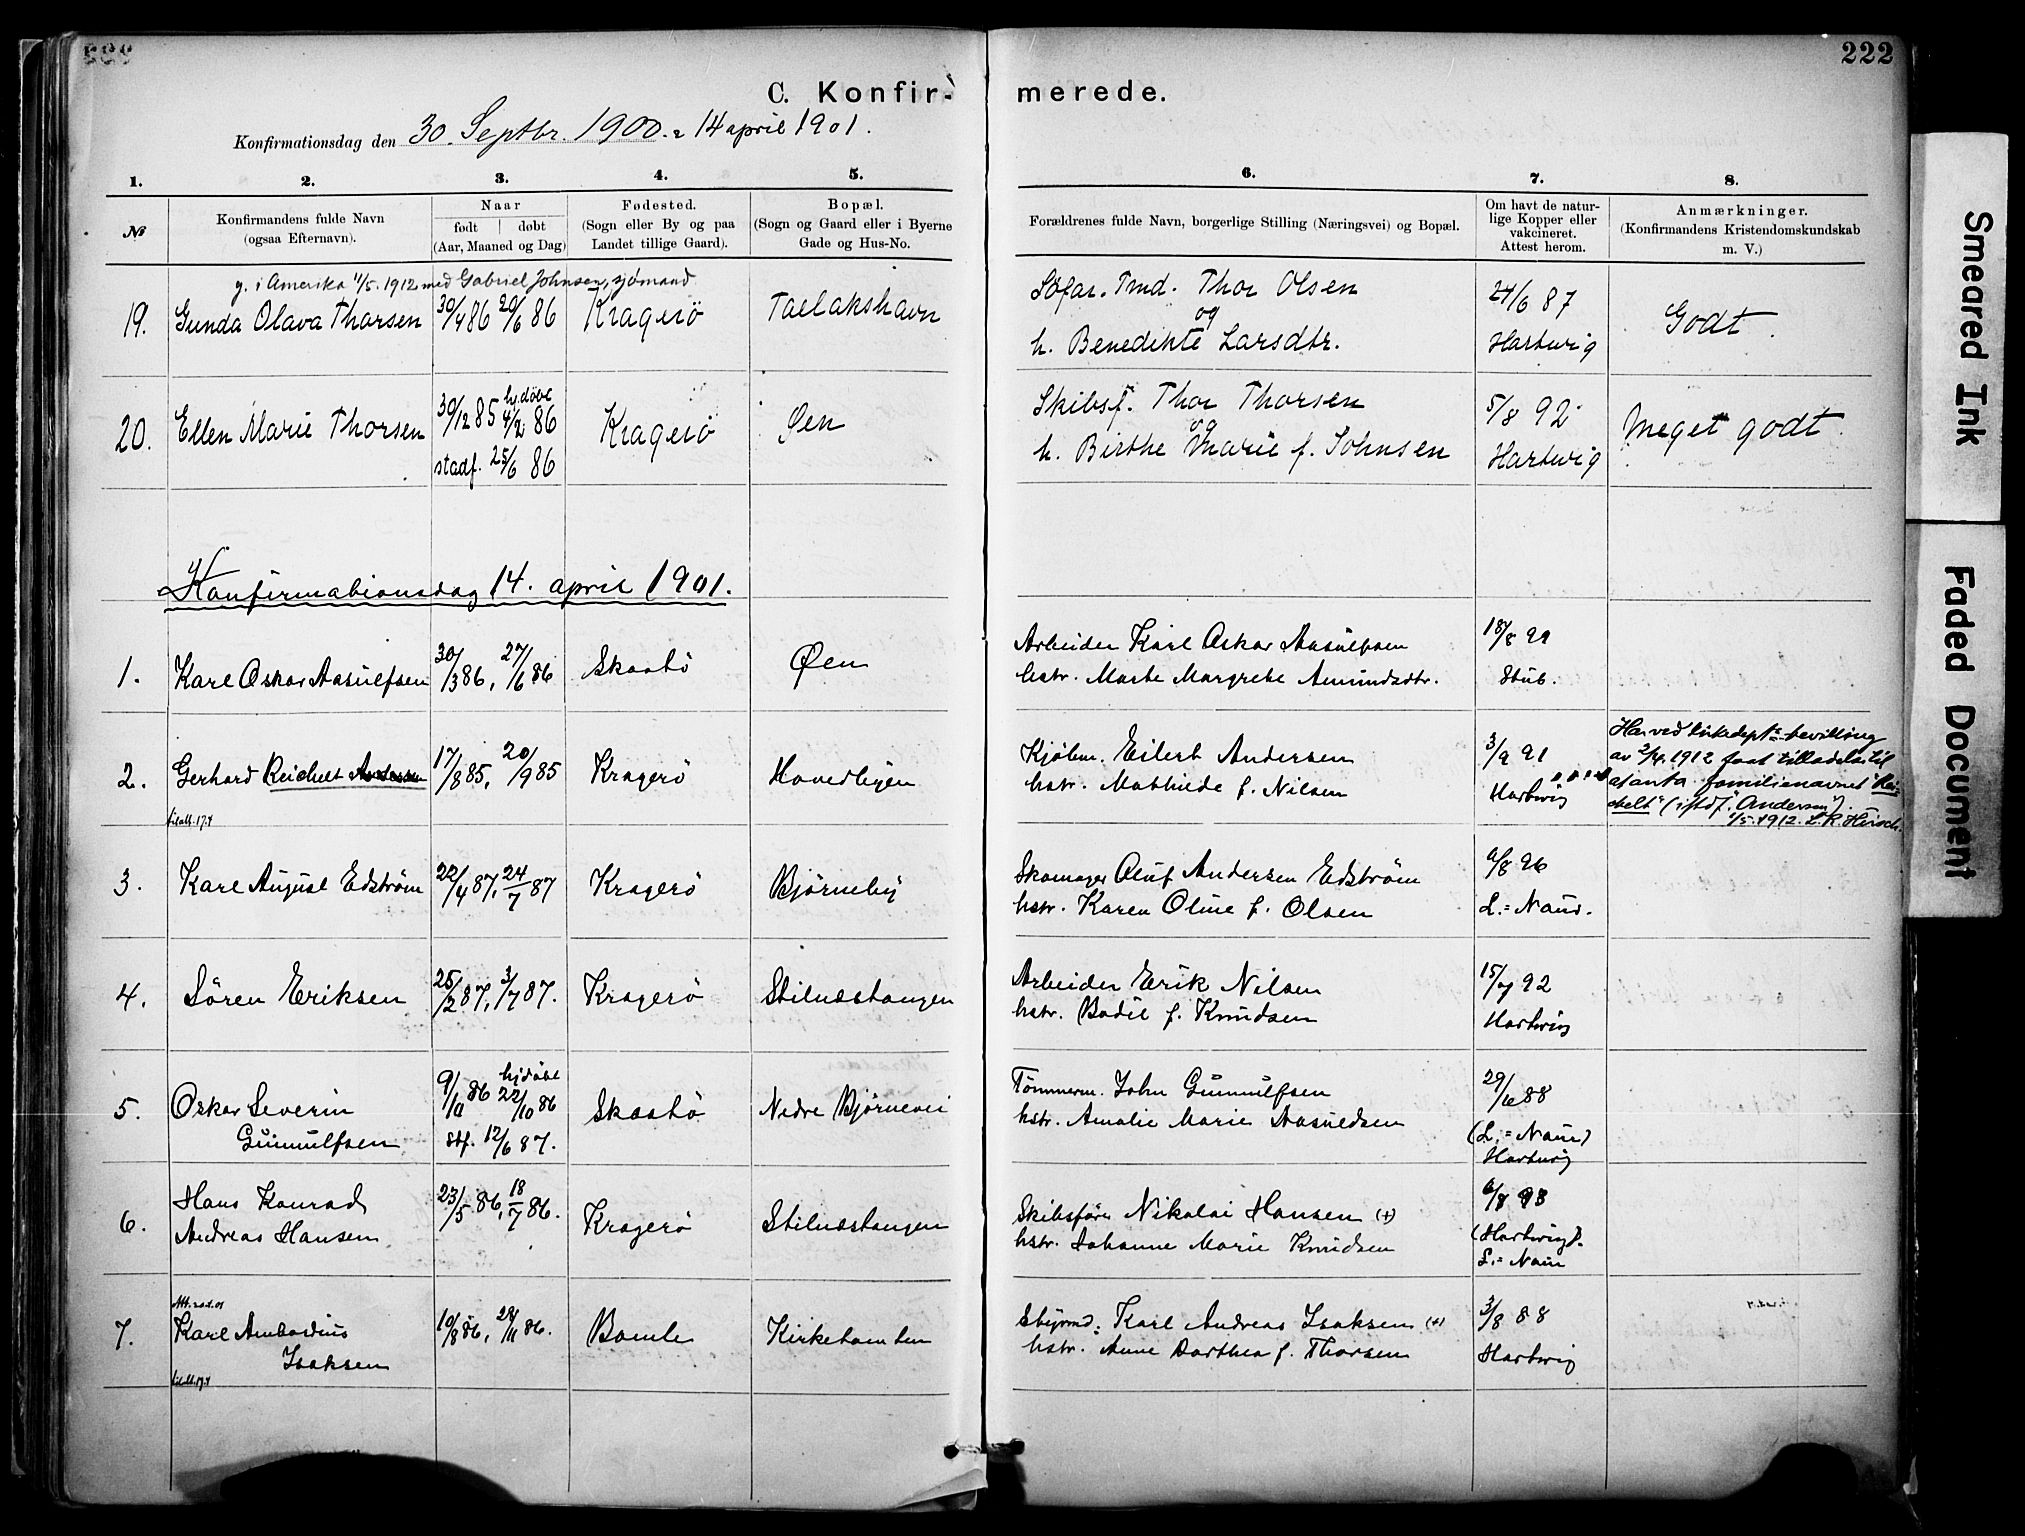 SAKO, Kragerø kirkebøker, F/Fa/L0012: Ministerialbok nr. I 12, 1880-1904, s. 222